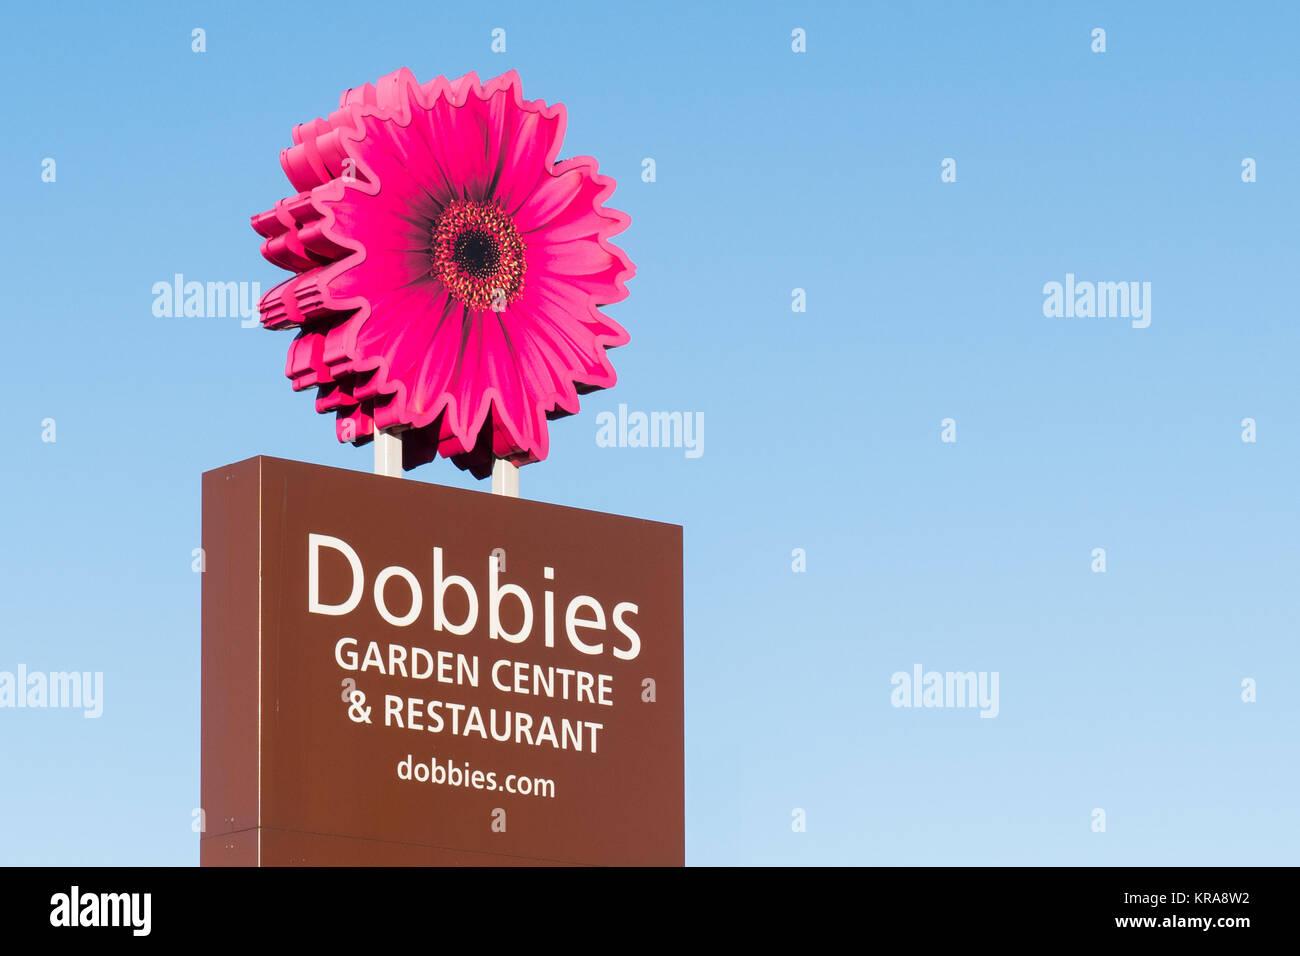 Dobbies Garden Centre and Restaurant sign and logo, Braehead, Glasgow, Scotland, UK - Stock Image